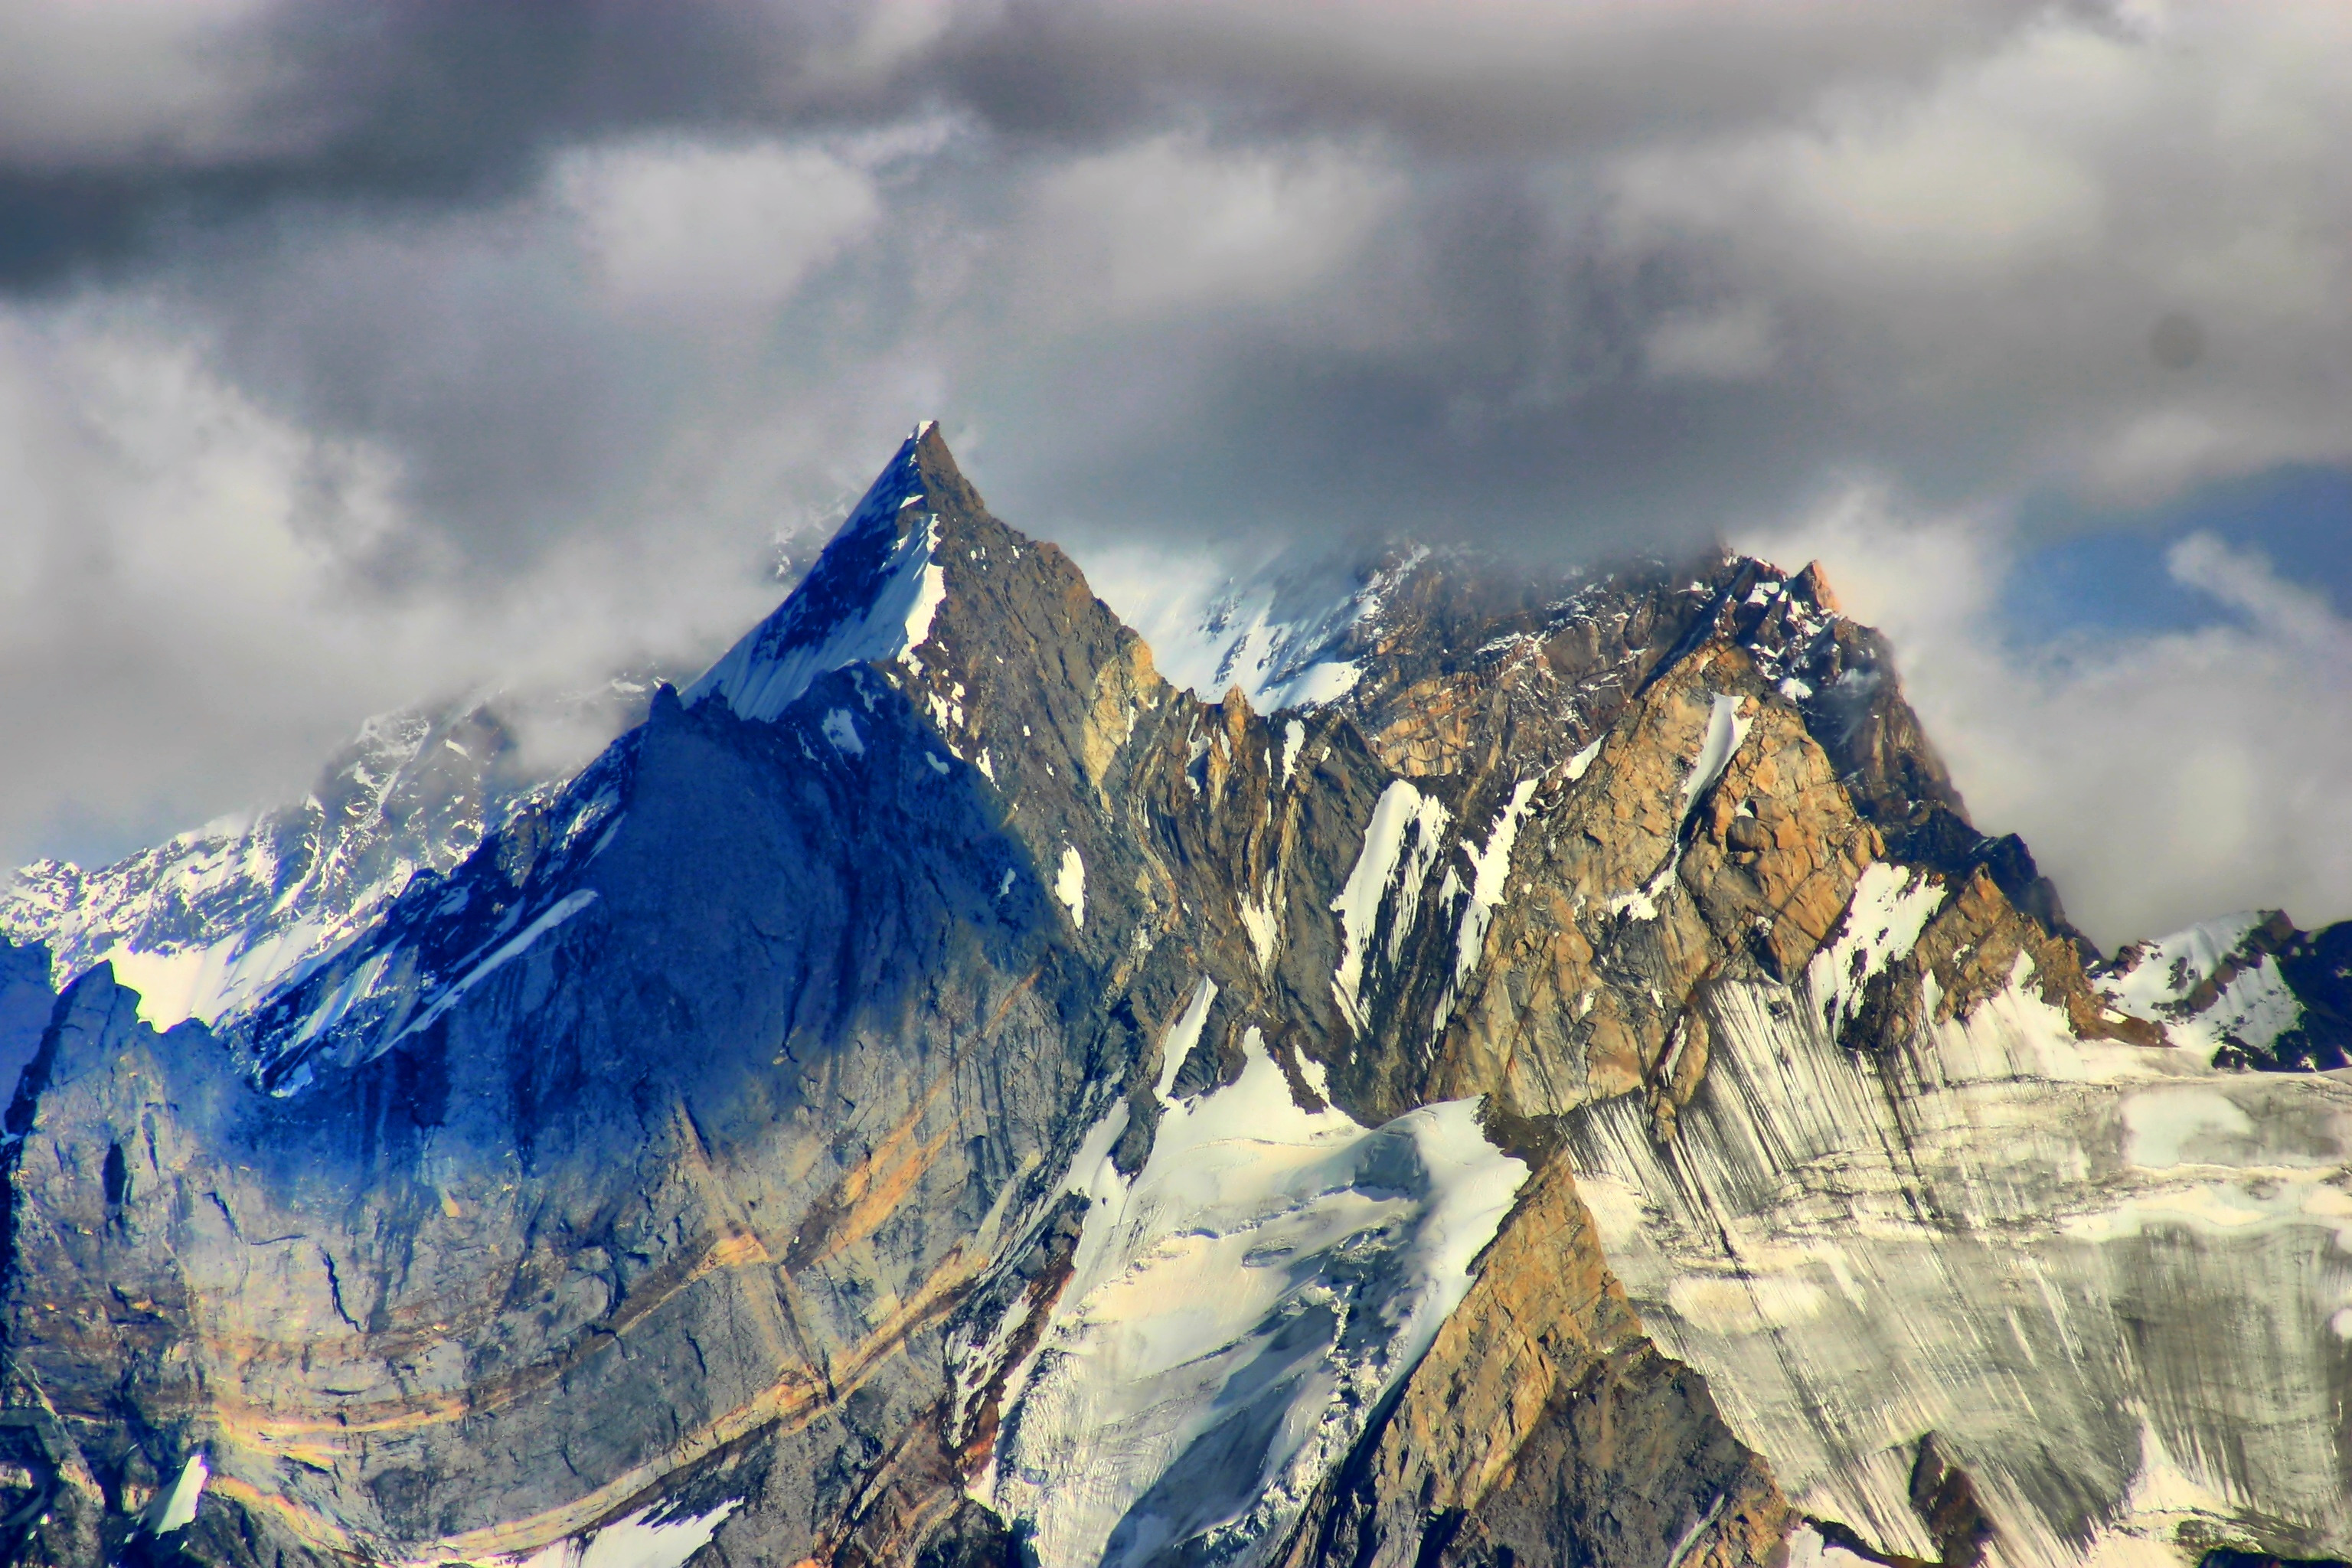 1519613071_rocks_of_nun_kun_massif__28ladakh-india_29.jpg